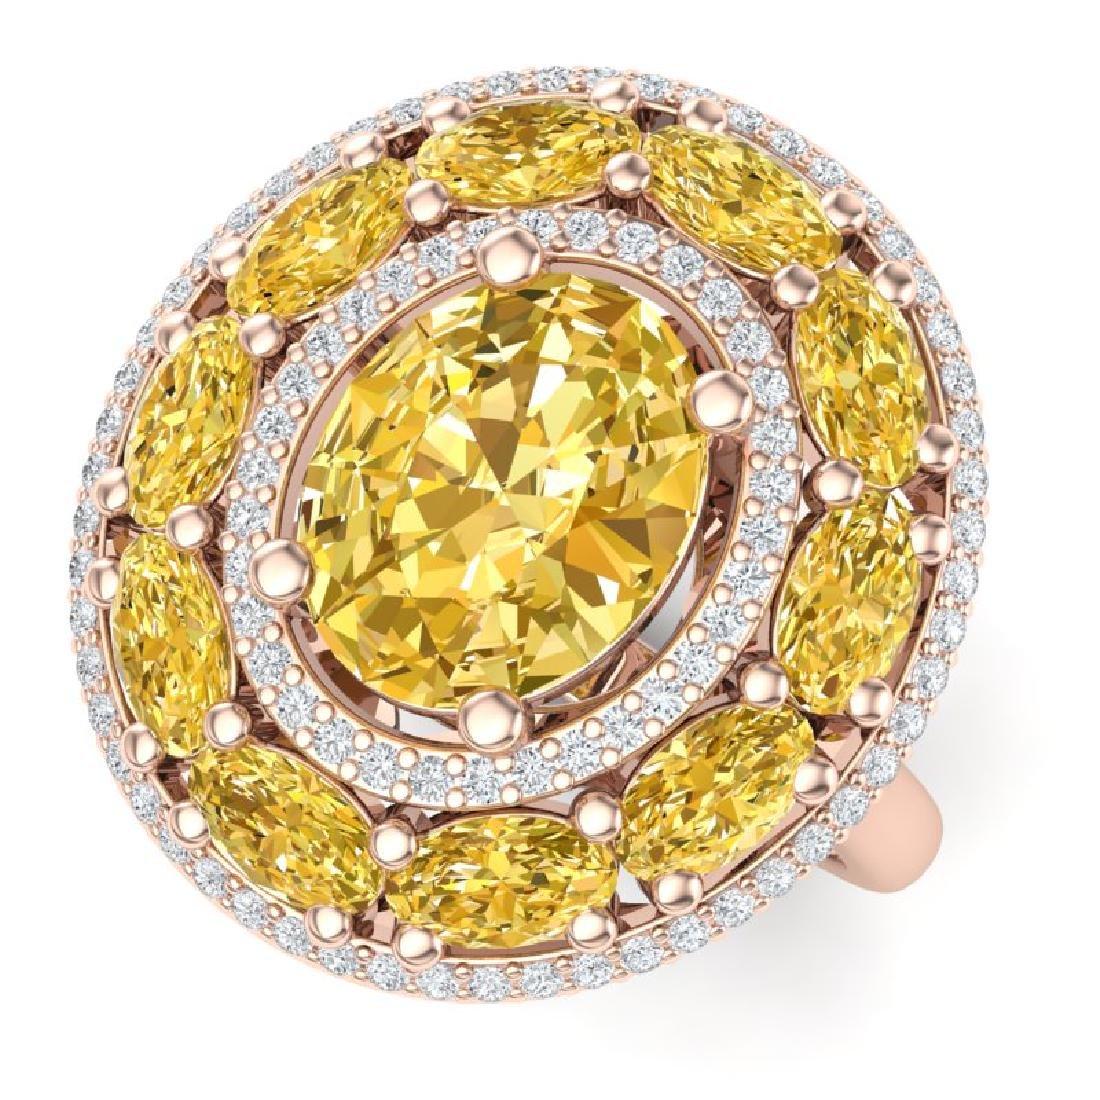 7.21 CTW Royalty Canary Citrine & VS Diamond Ring 18K